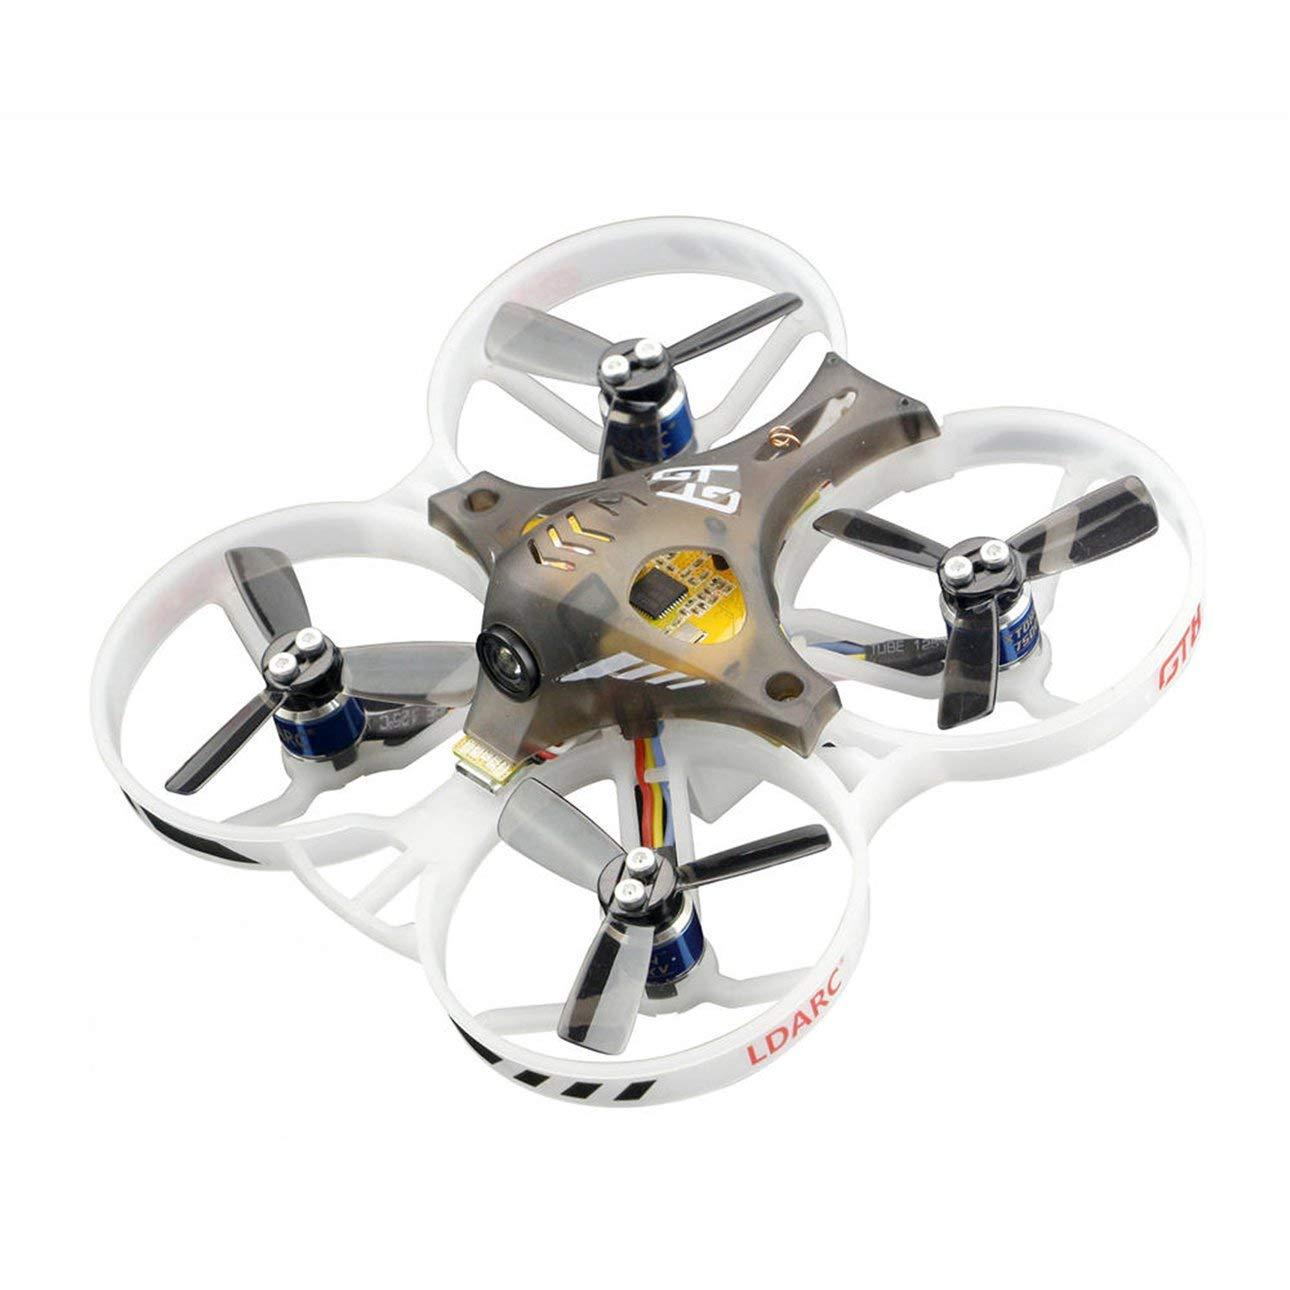 descuento online Ballylelly Drone RC con CameraLDARC Tiny GT7 75mm 75mm 75mm 2S FPV Mini Brushless Racing Drone Quadcopter con Receptor RX2A Pro F3 800TVL Cámara 25mW VTX PNP  venta con descuento